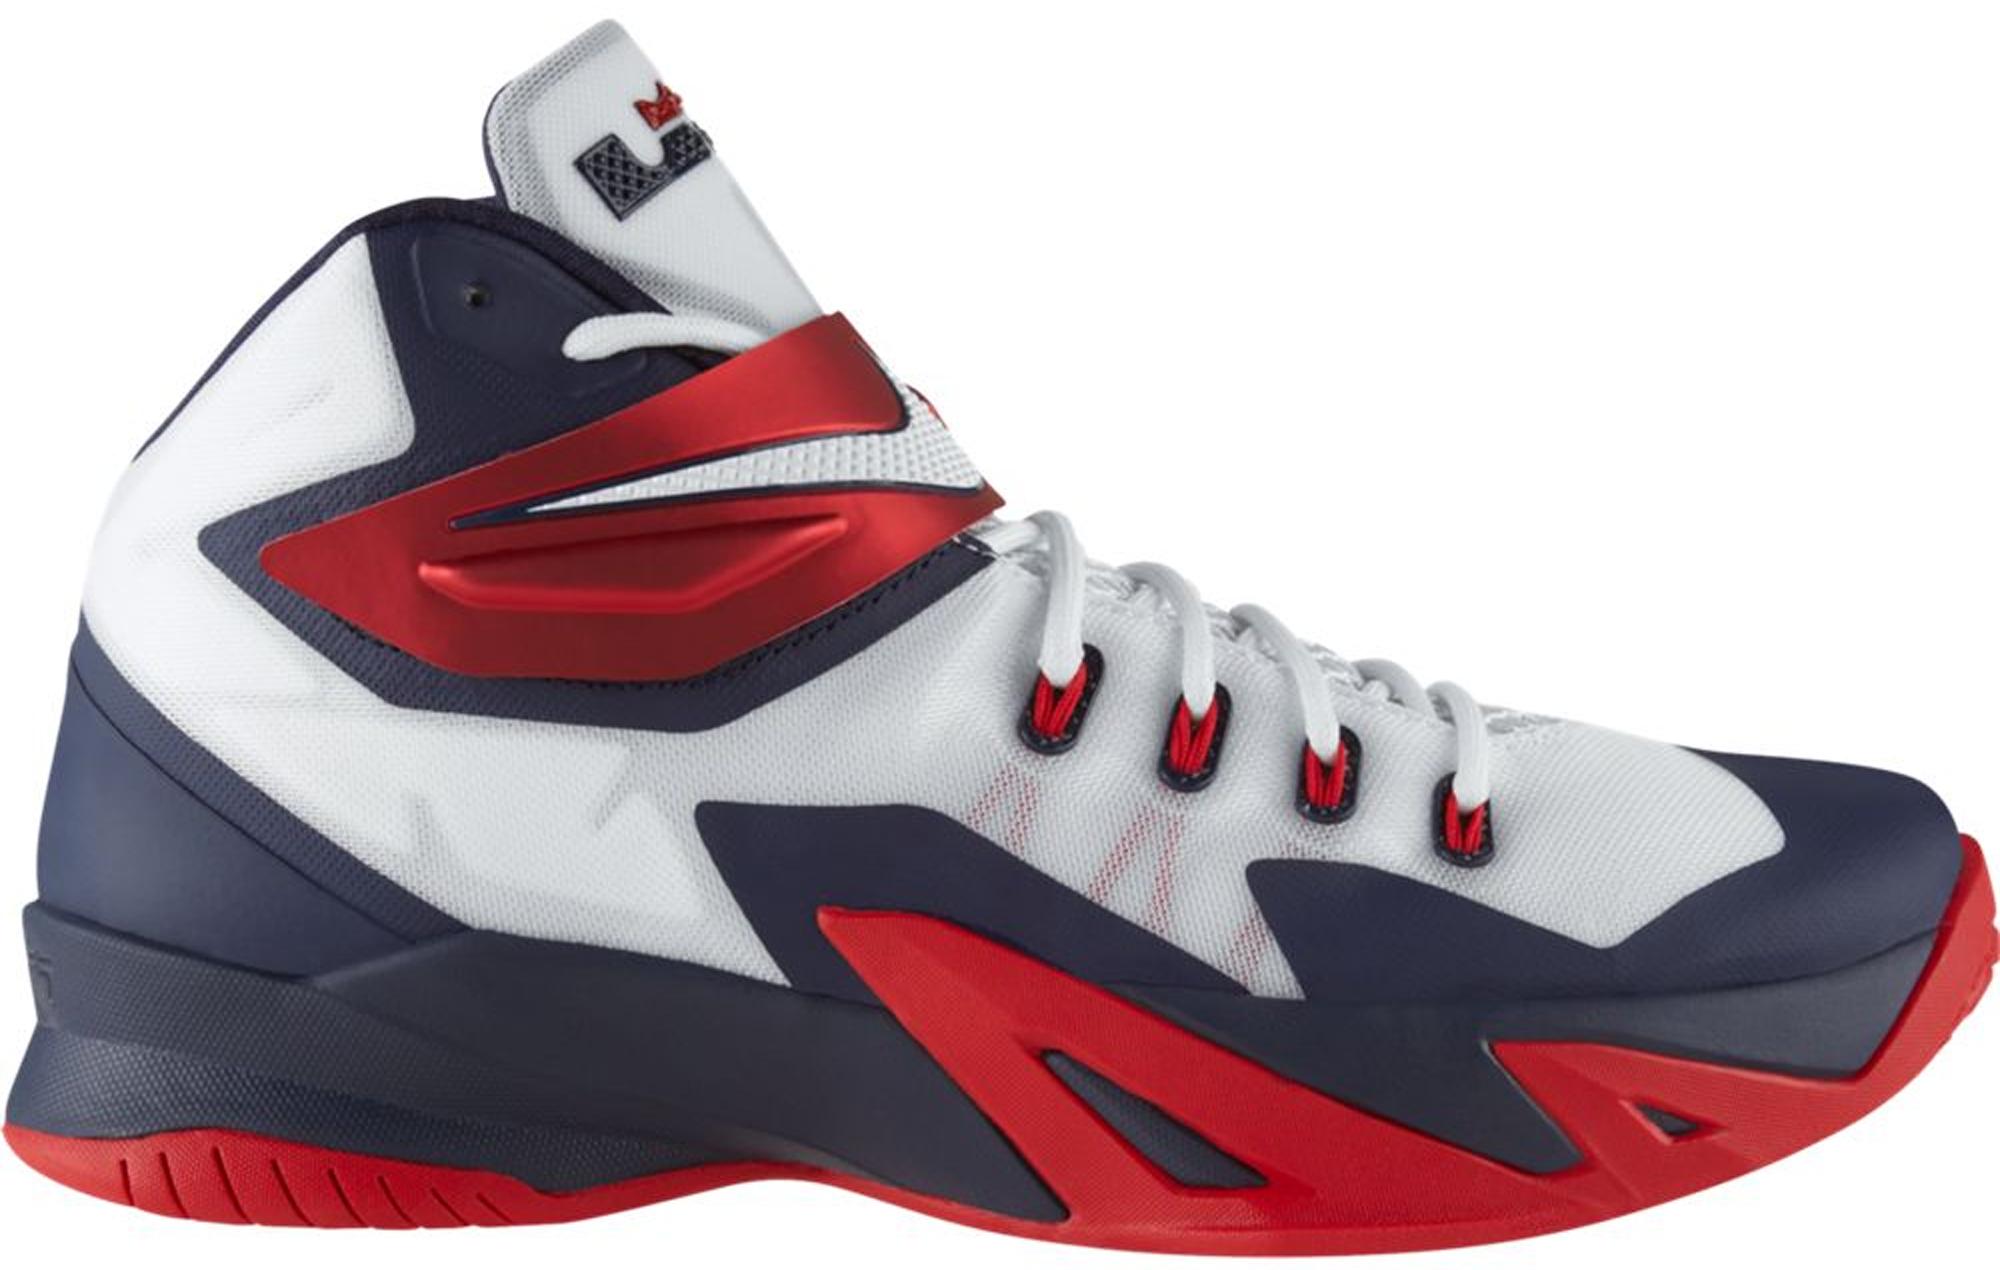 Nike LeBron Soldier 8 USA - 653641-114